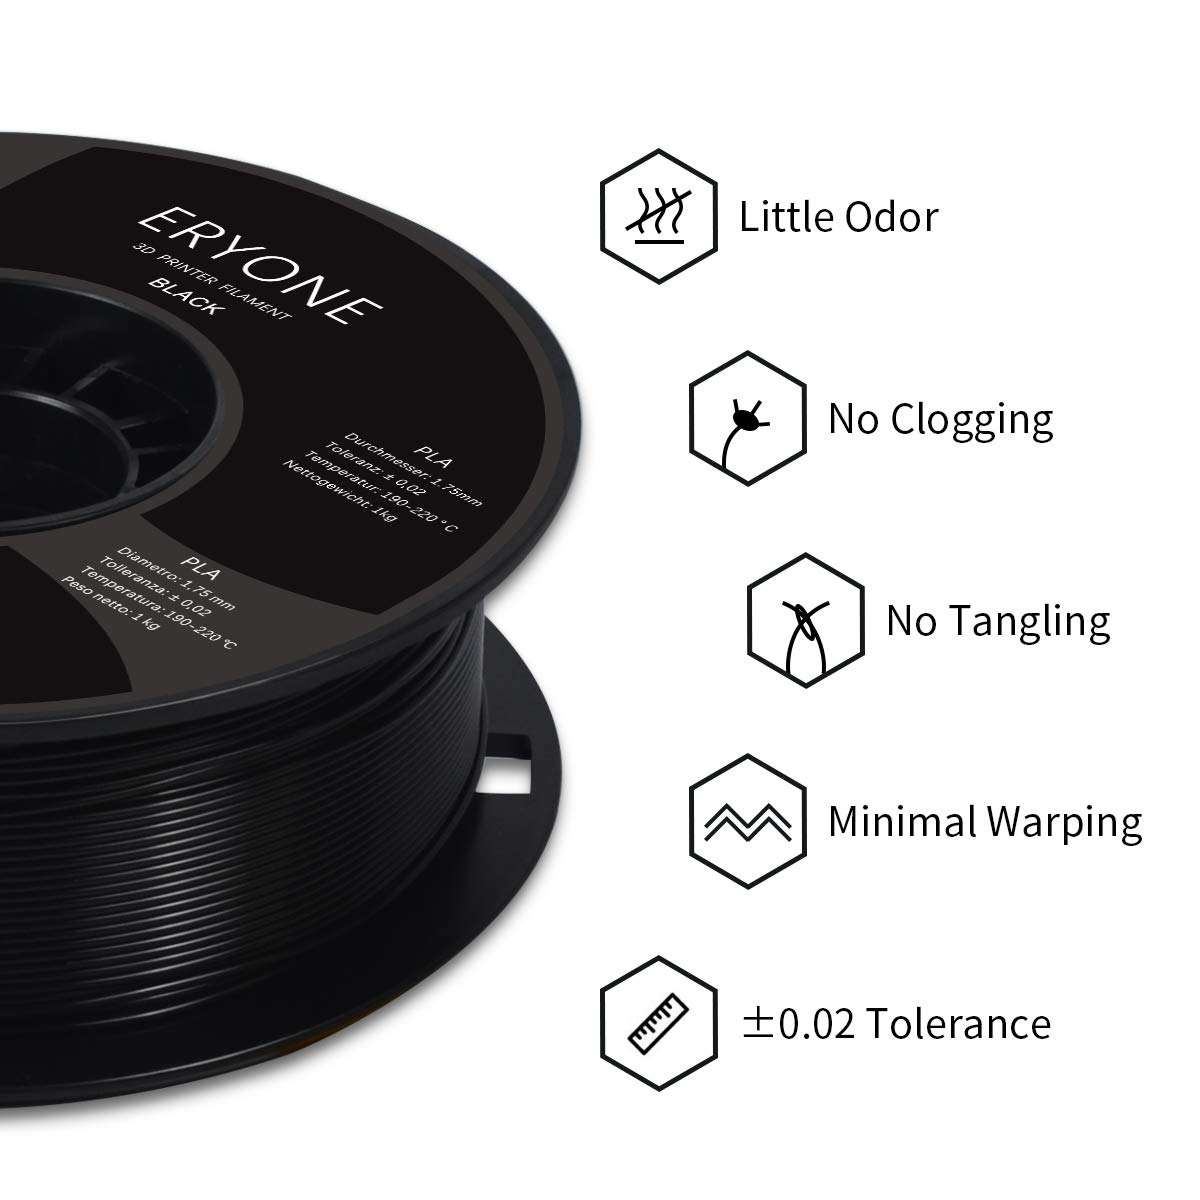 1kg 1 Spool 3D Printing Filament PLA for 3D Printer PLA Black ERYONE Filament PLA 1.75mm,PLA 1.75mm Filament